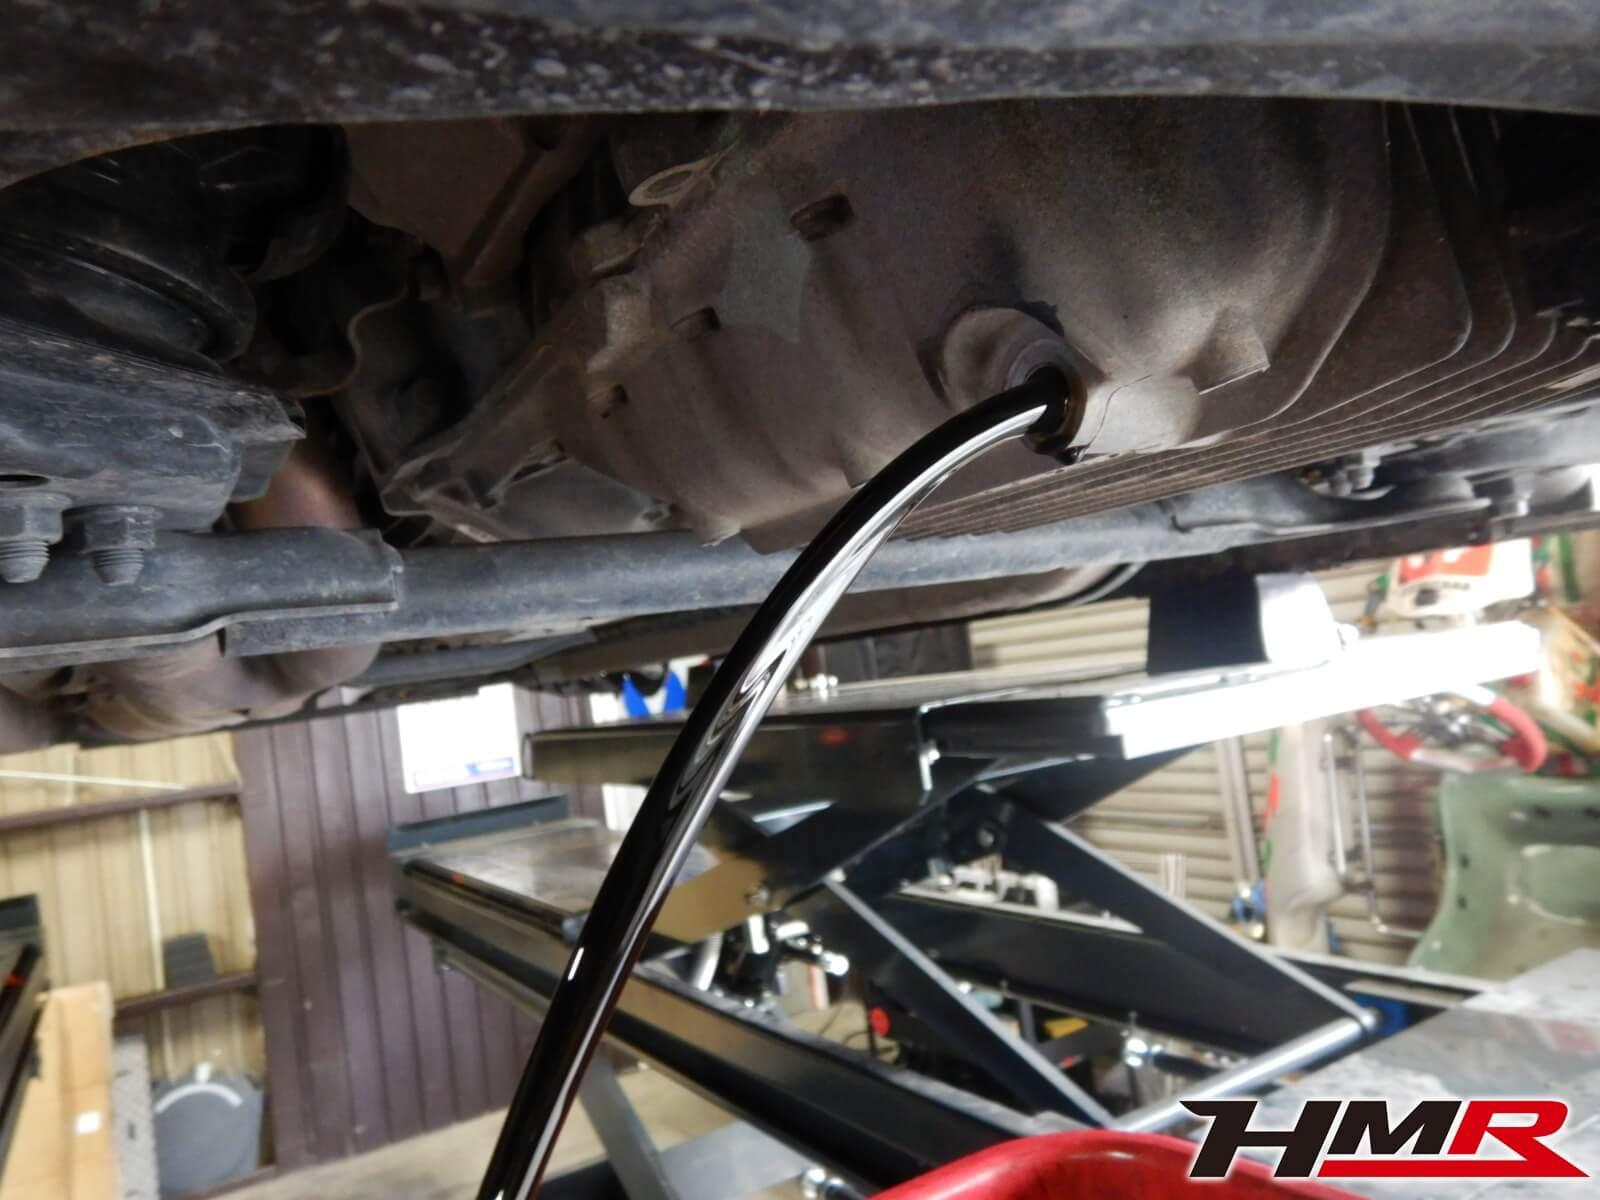 S2000 AP1 納車前整備 エアクリーナ スパークプラグ エンジンオイル トランスミッションオイル デフオイル 交換